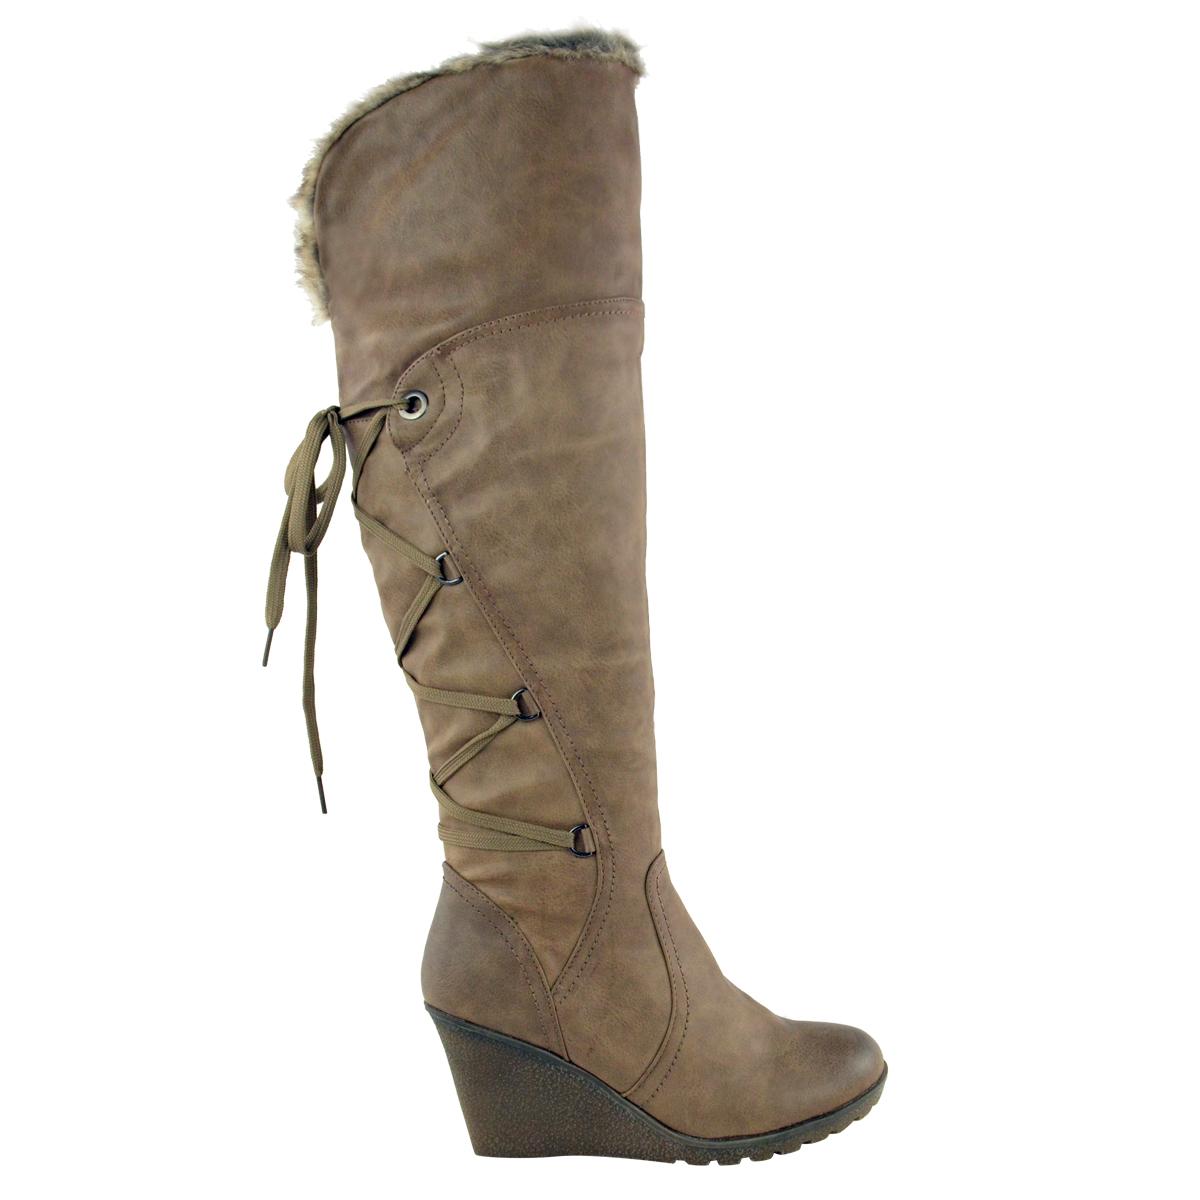 Womens-Ladies-Wedge-Low-Heel-Winter-Knee-Boots-Warm-Faux-Fur-Fleece-Size-UK thumbnail 8